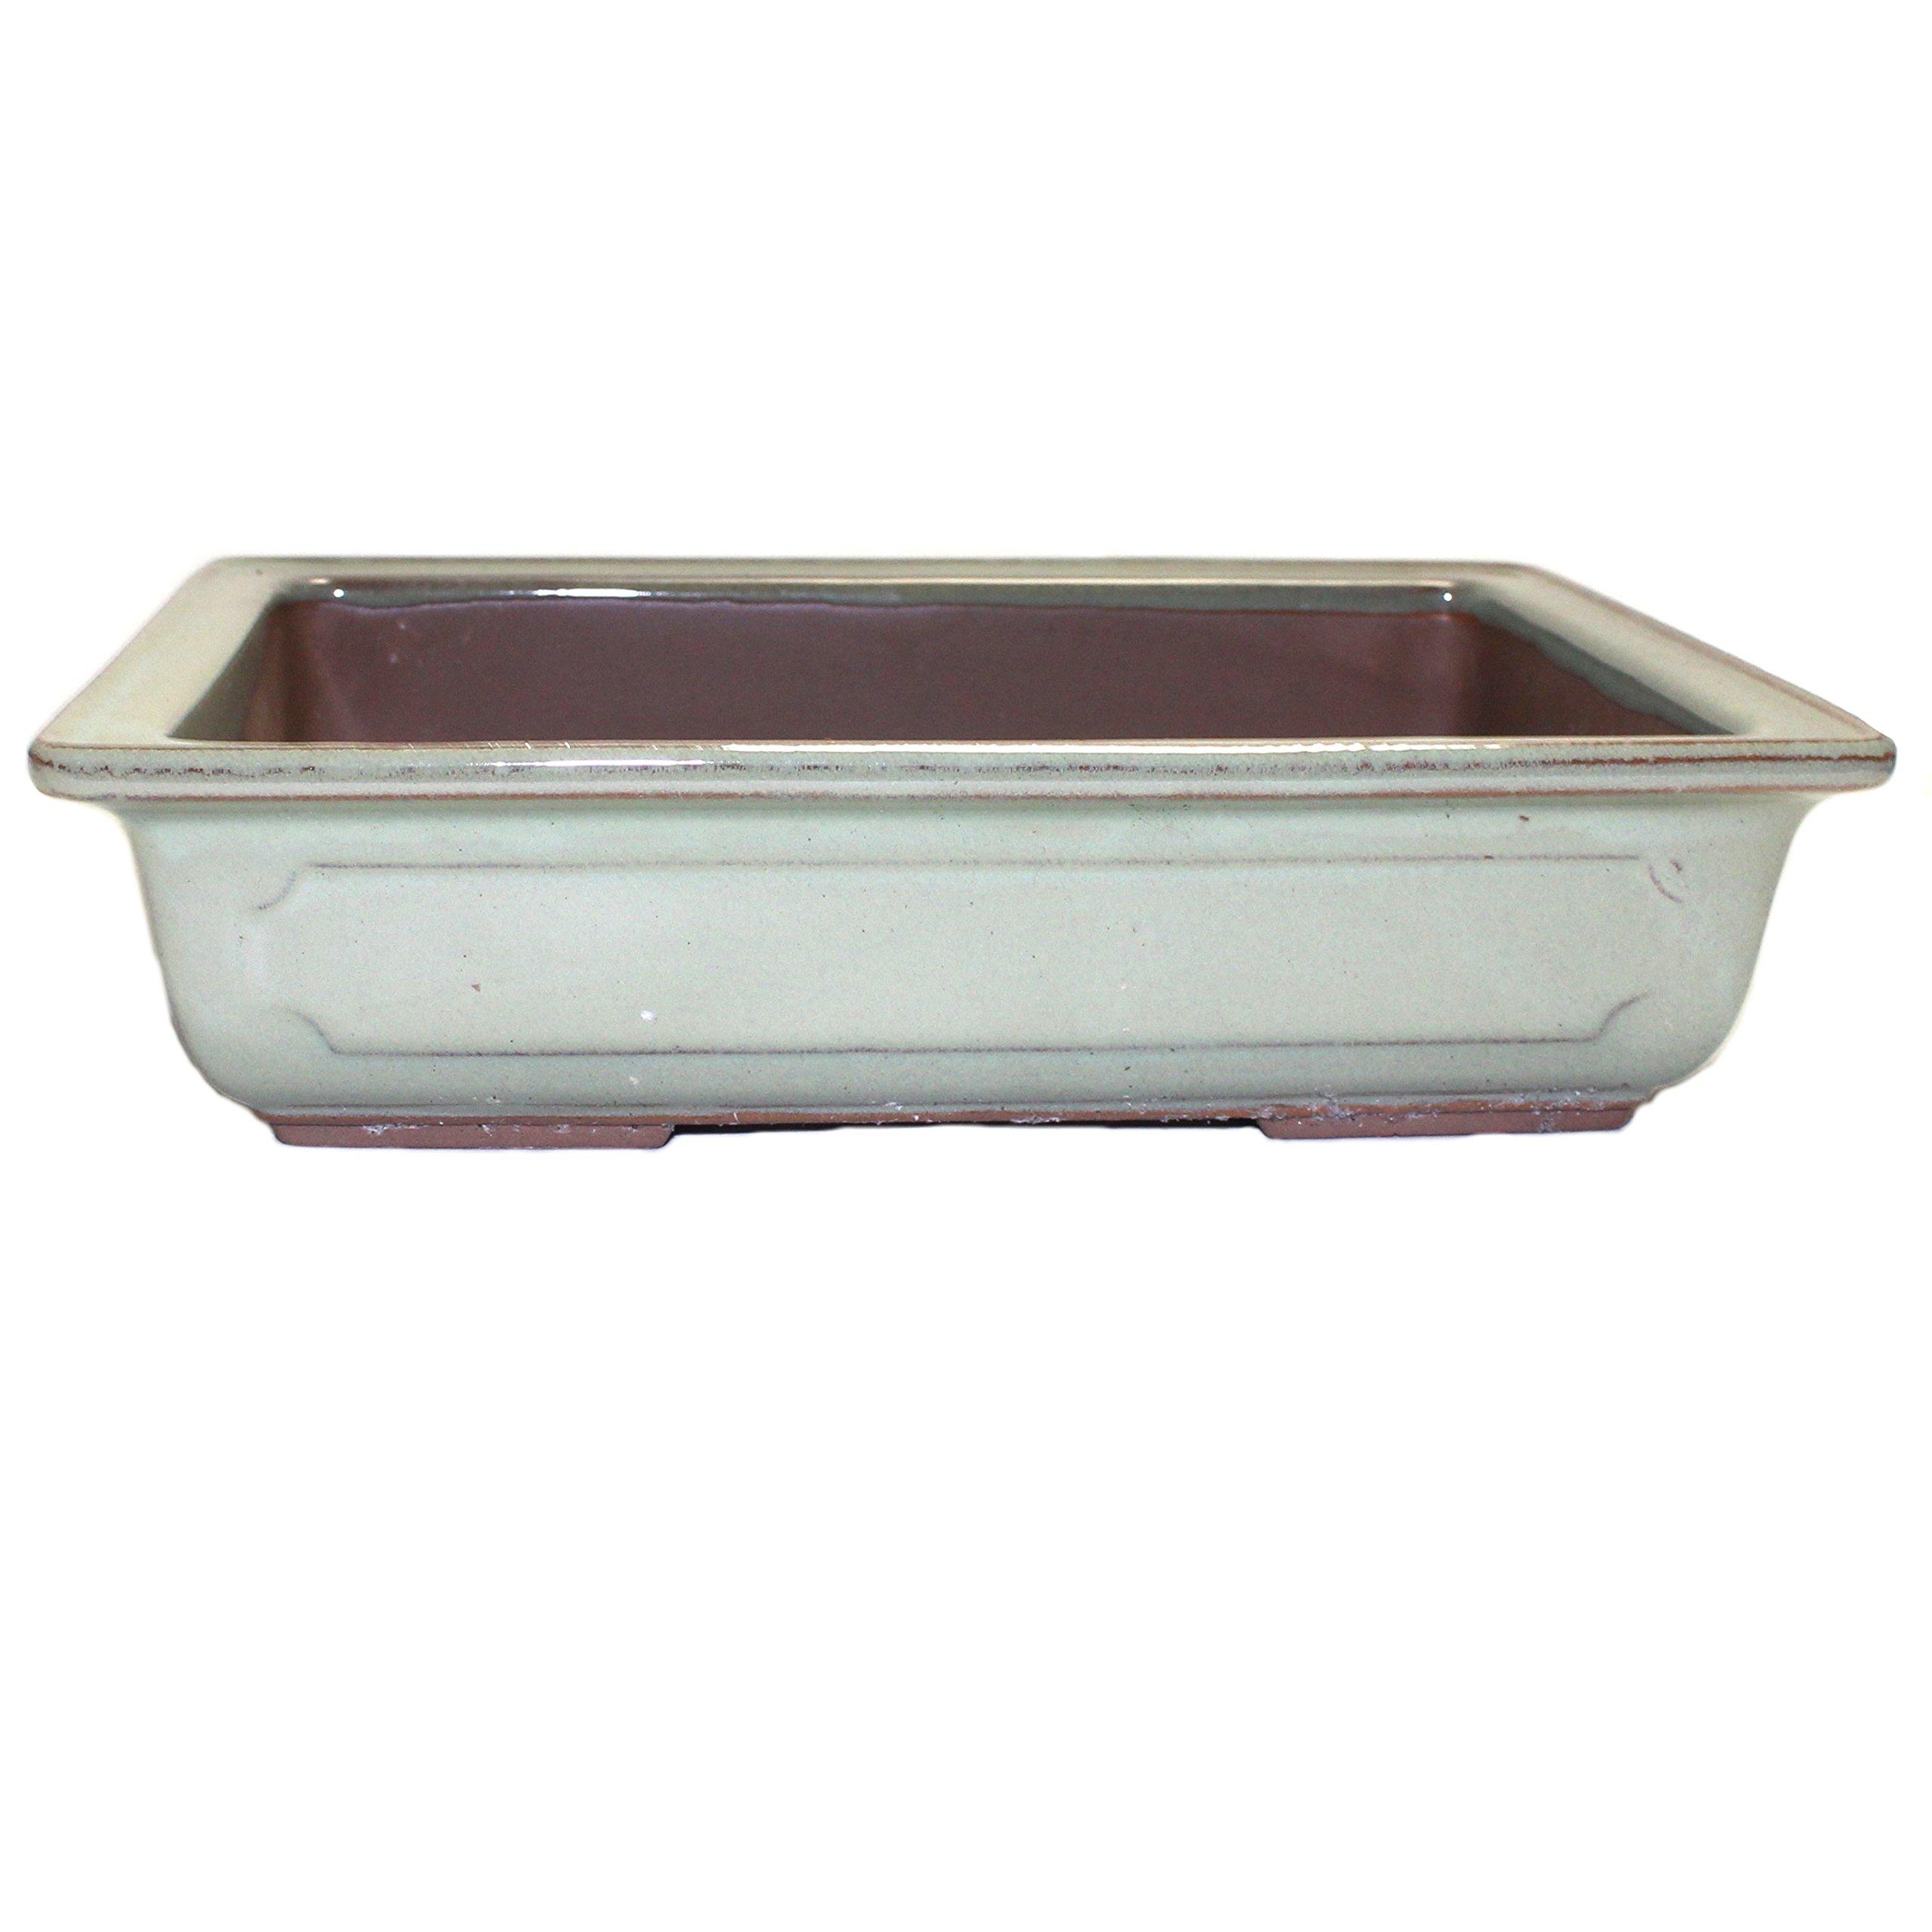 Bonsai Pot Ceramic Rectangle Window Shaped Decorations (9'', Oribe-Yu)